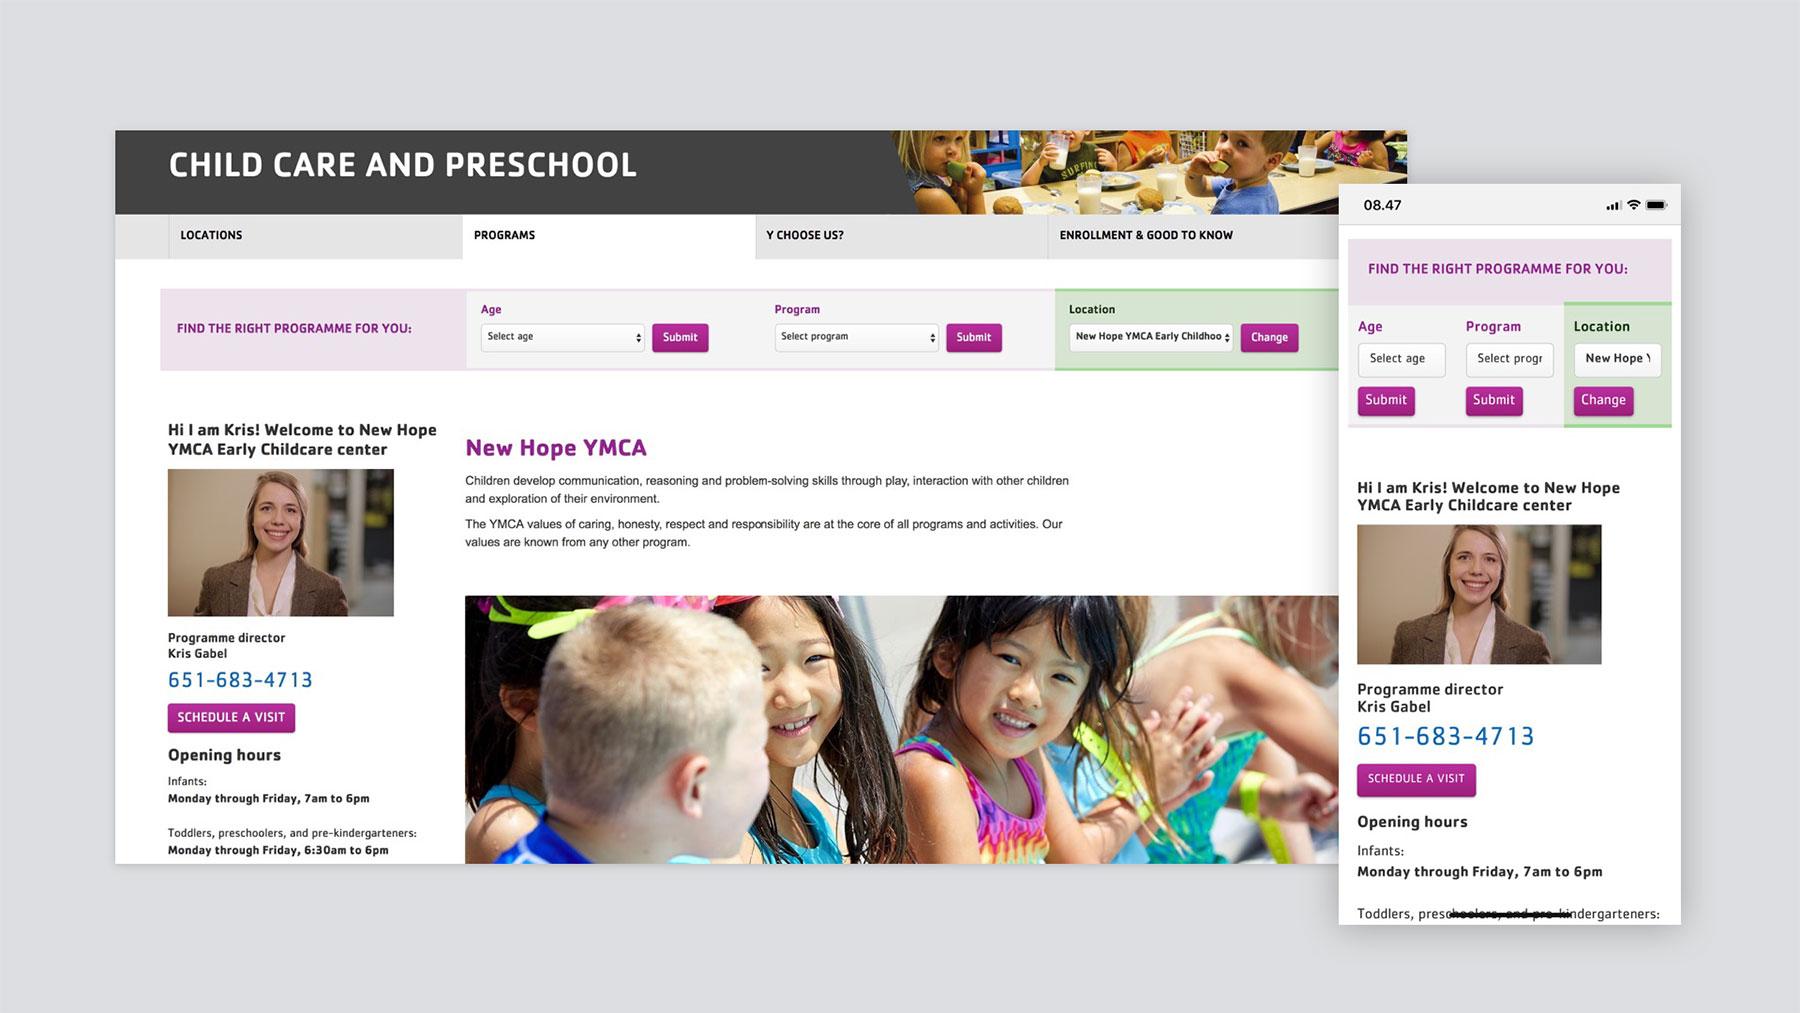 The YMCA day care prototype design